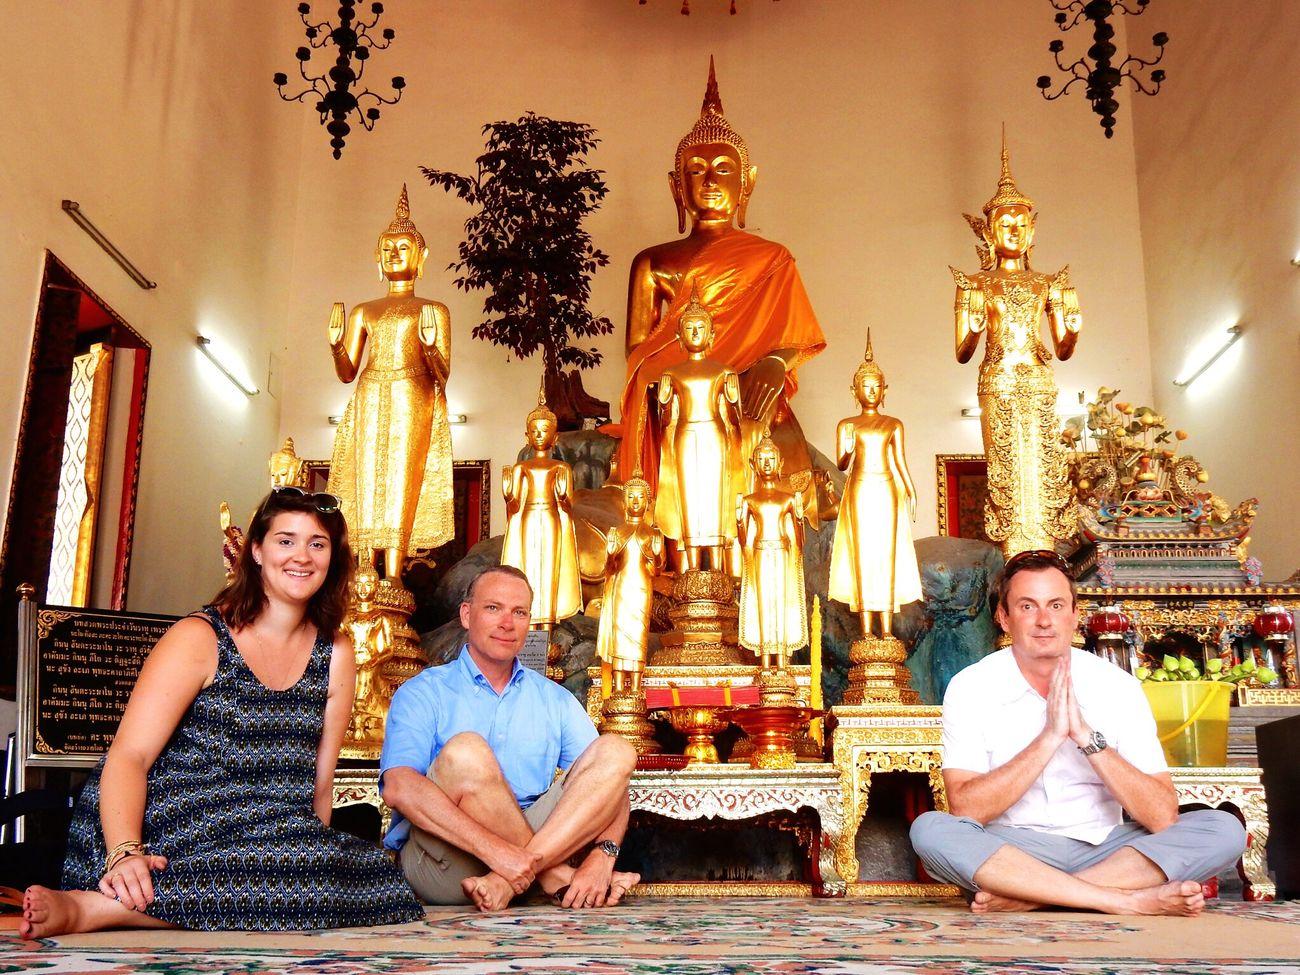 Bangkok Thailand Wat Pho Stephen Blanchette